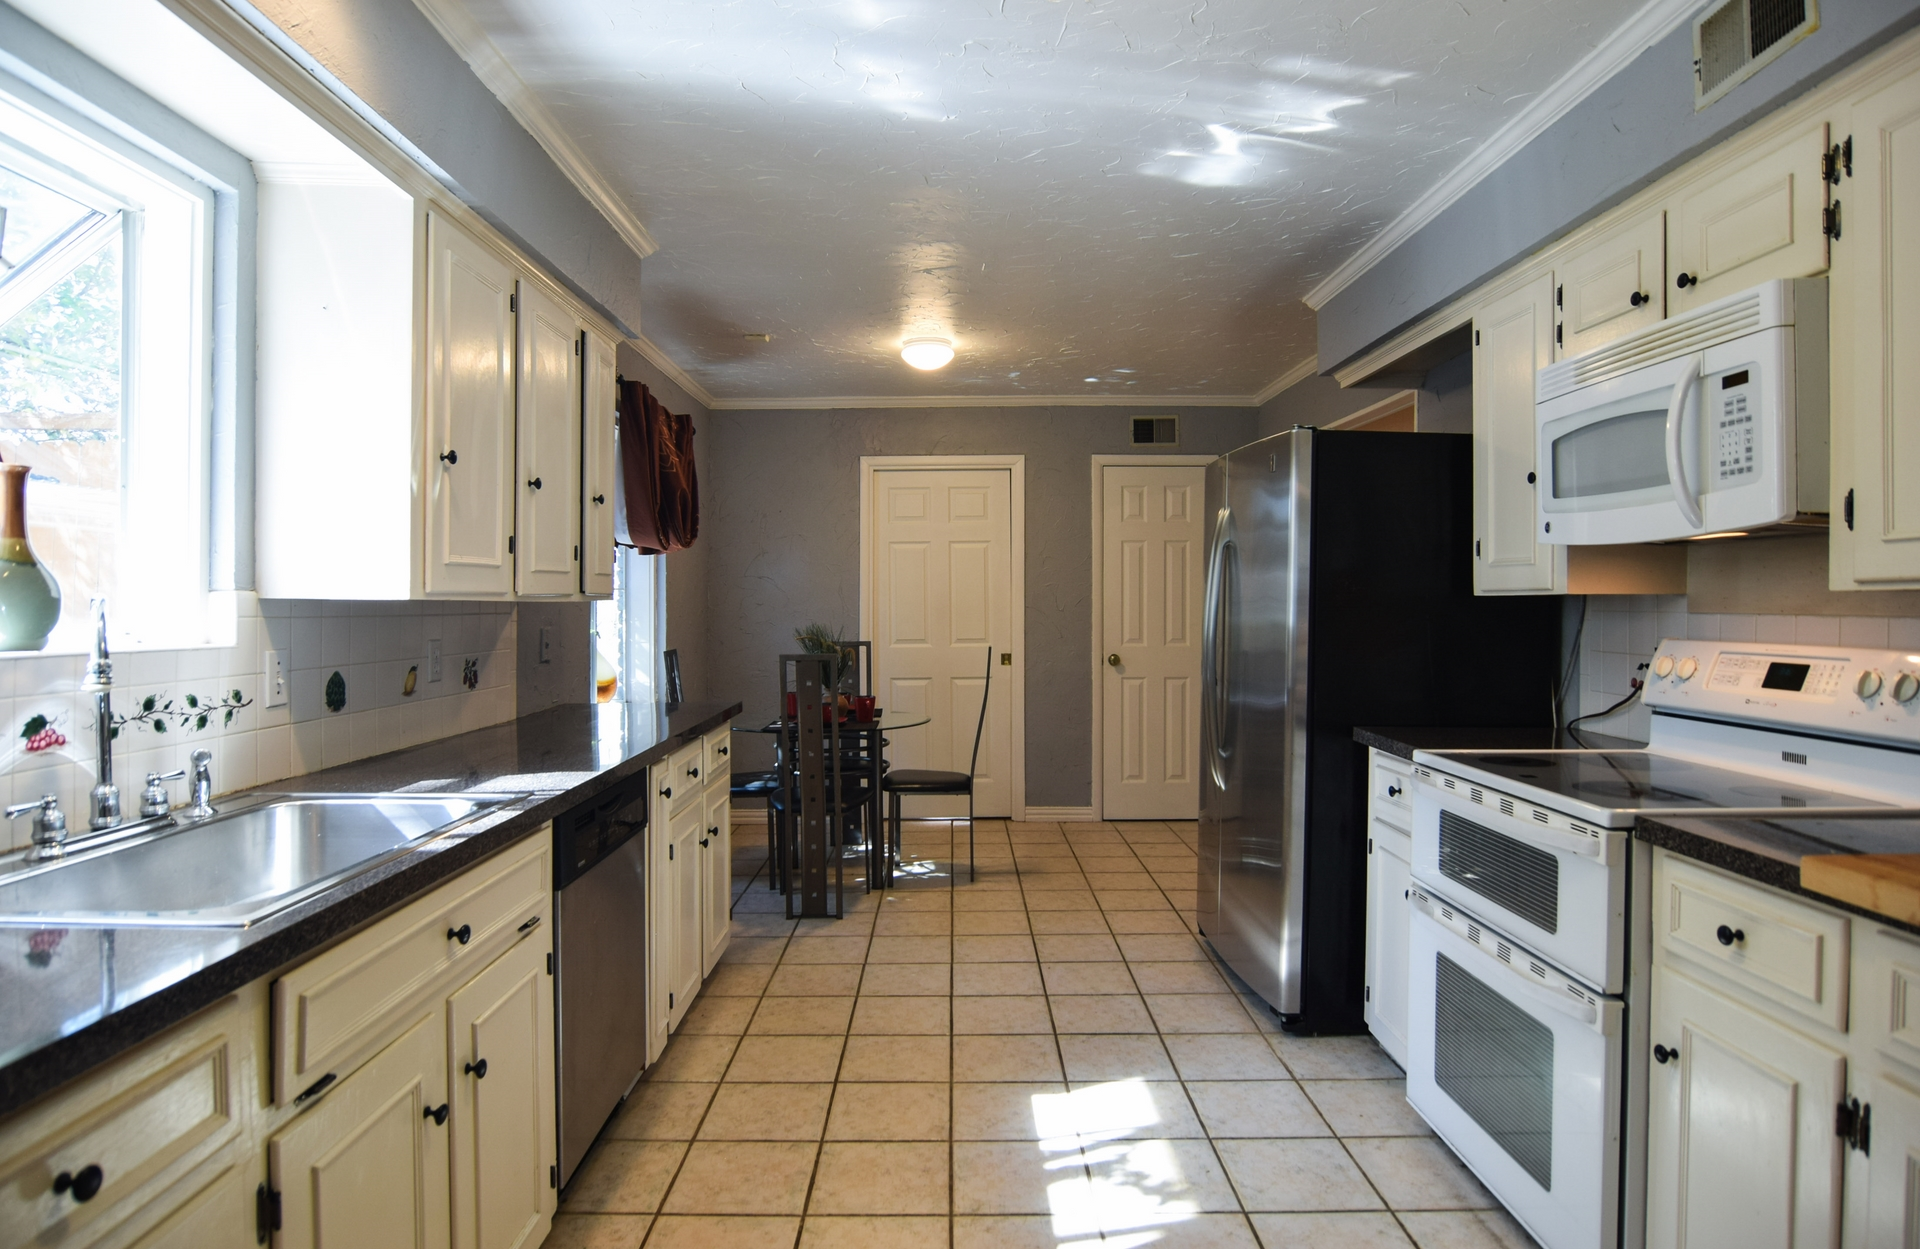 Kitchen 3235 Timberview Rd Dallas TX 75229.jpg